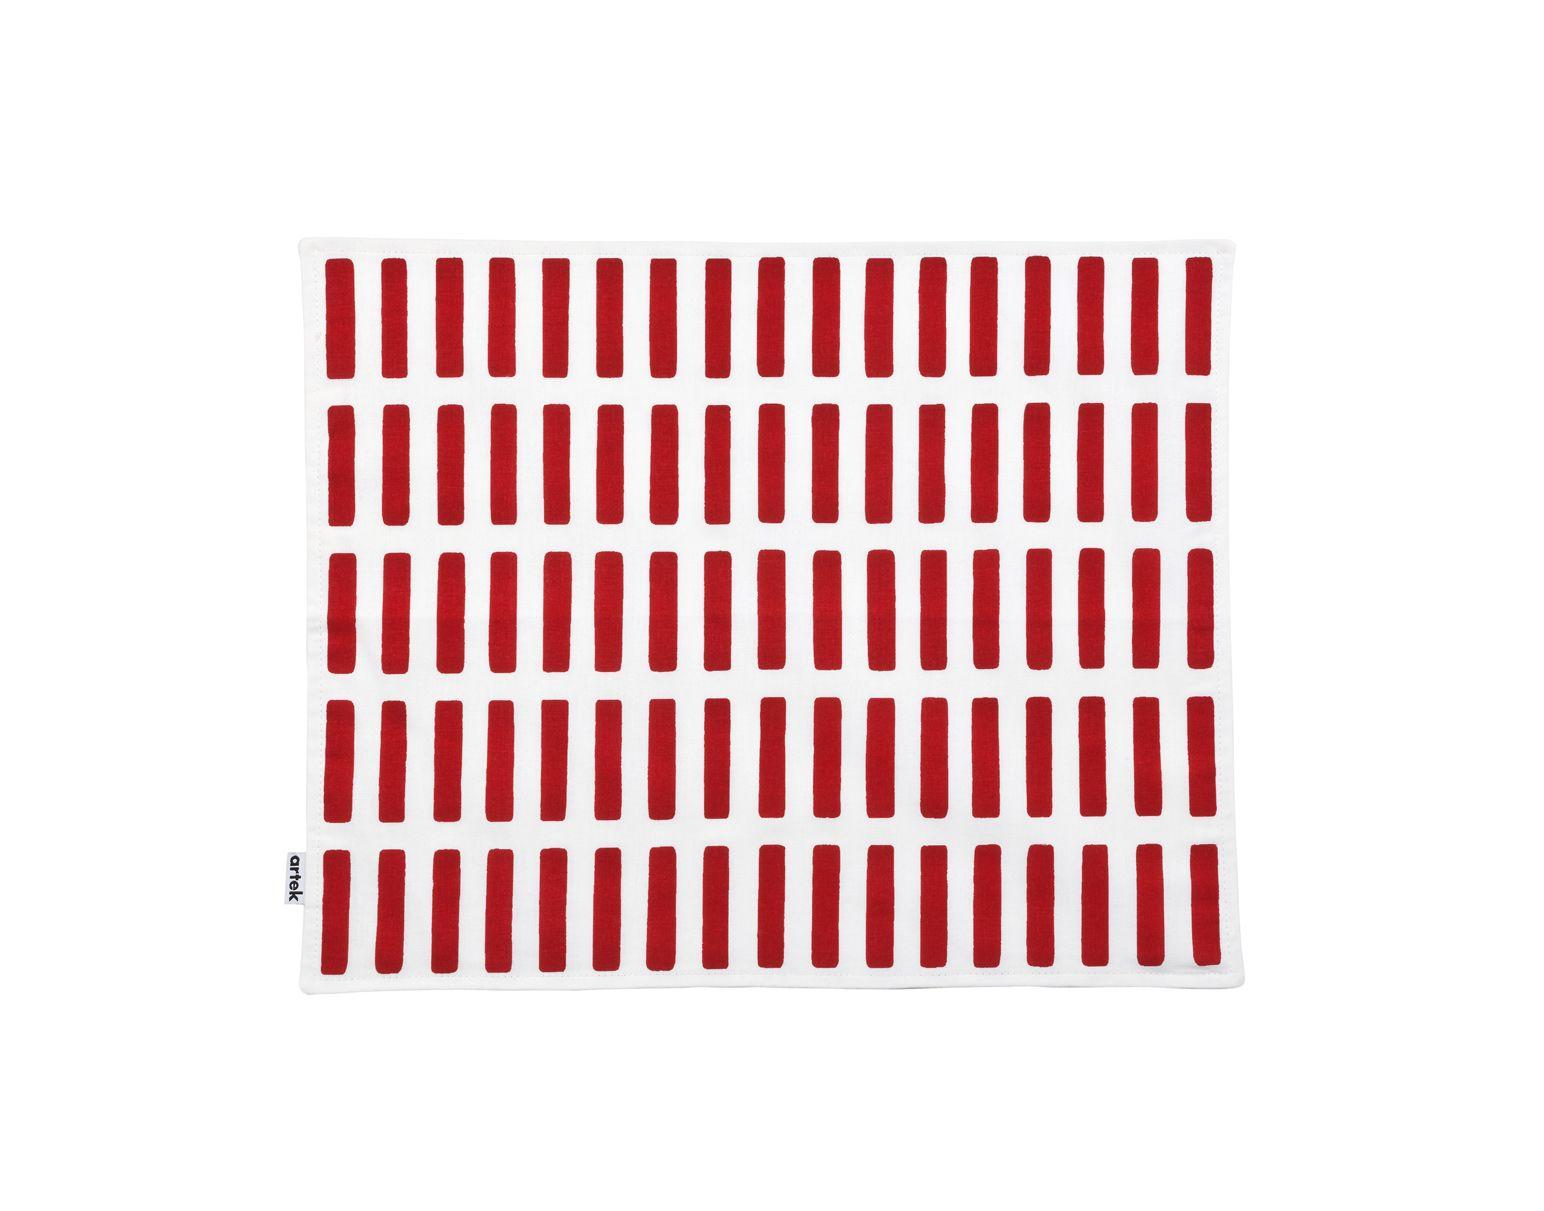 PLACE MAT SIENA – ABC COLLECTION – ARTEK | Artek USA